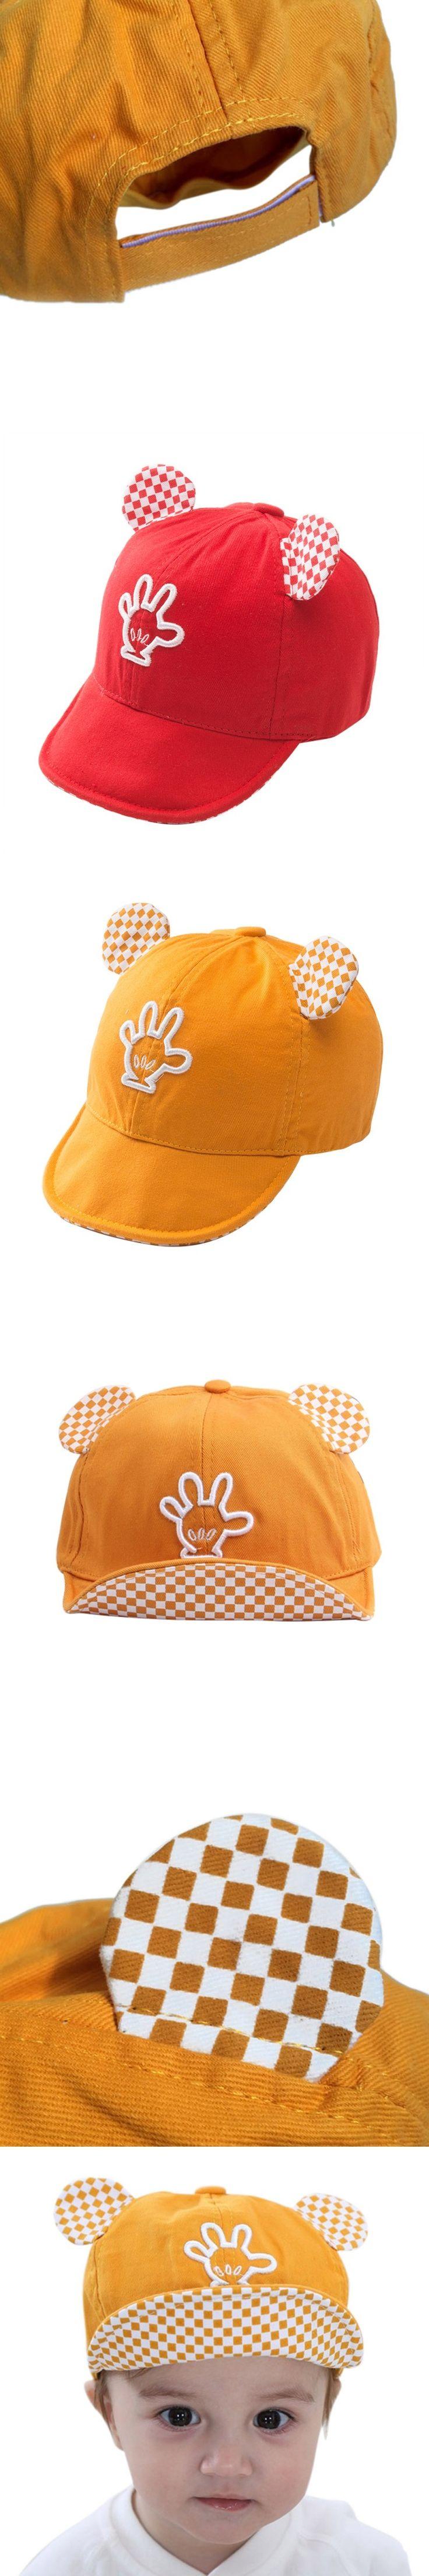 Kids Boys Girls Cotton Hats Caps Bear ear Plaid Print Toddler Caps Summer Beret Sun Visor Hat Cap Accessories